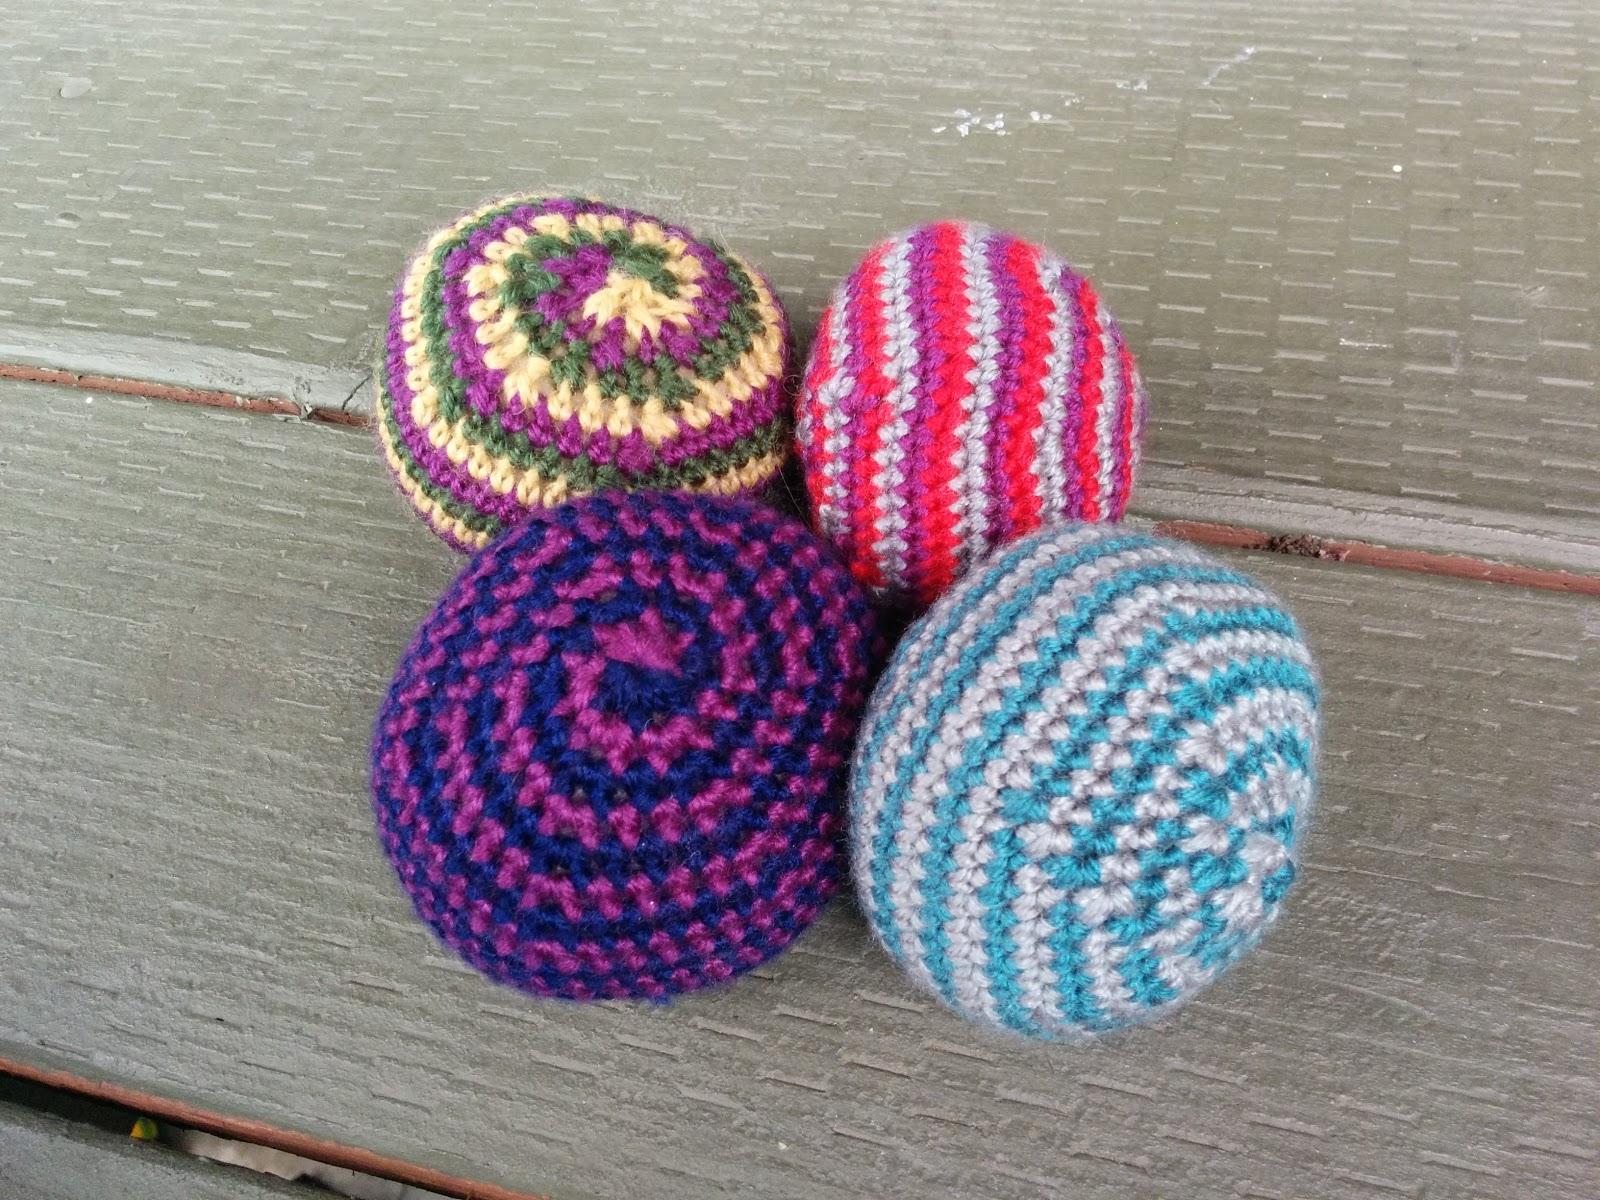 Ladybug Laboratory Hacky Sack Crochet Spiral